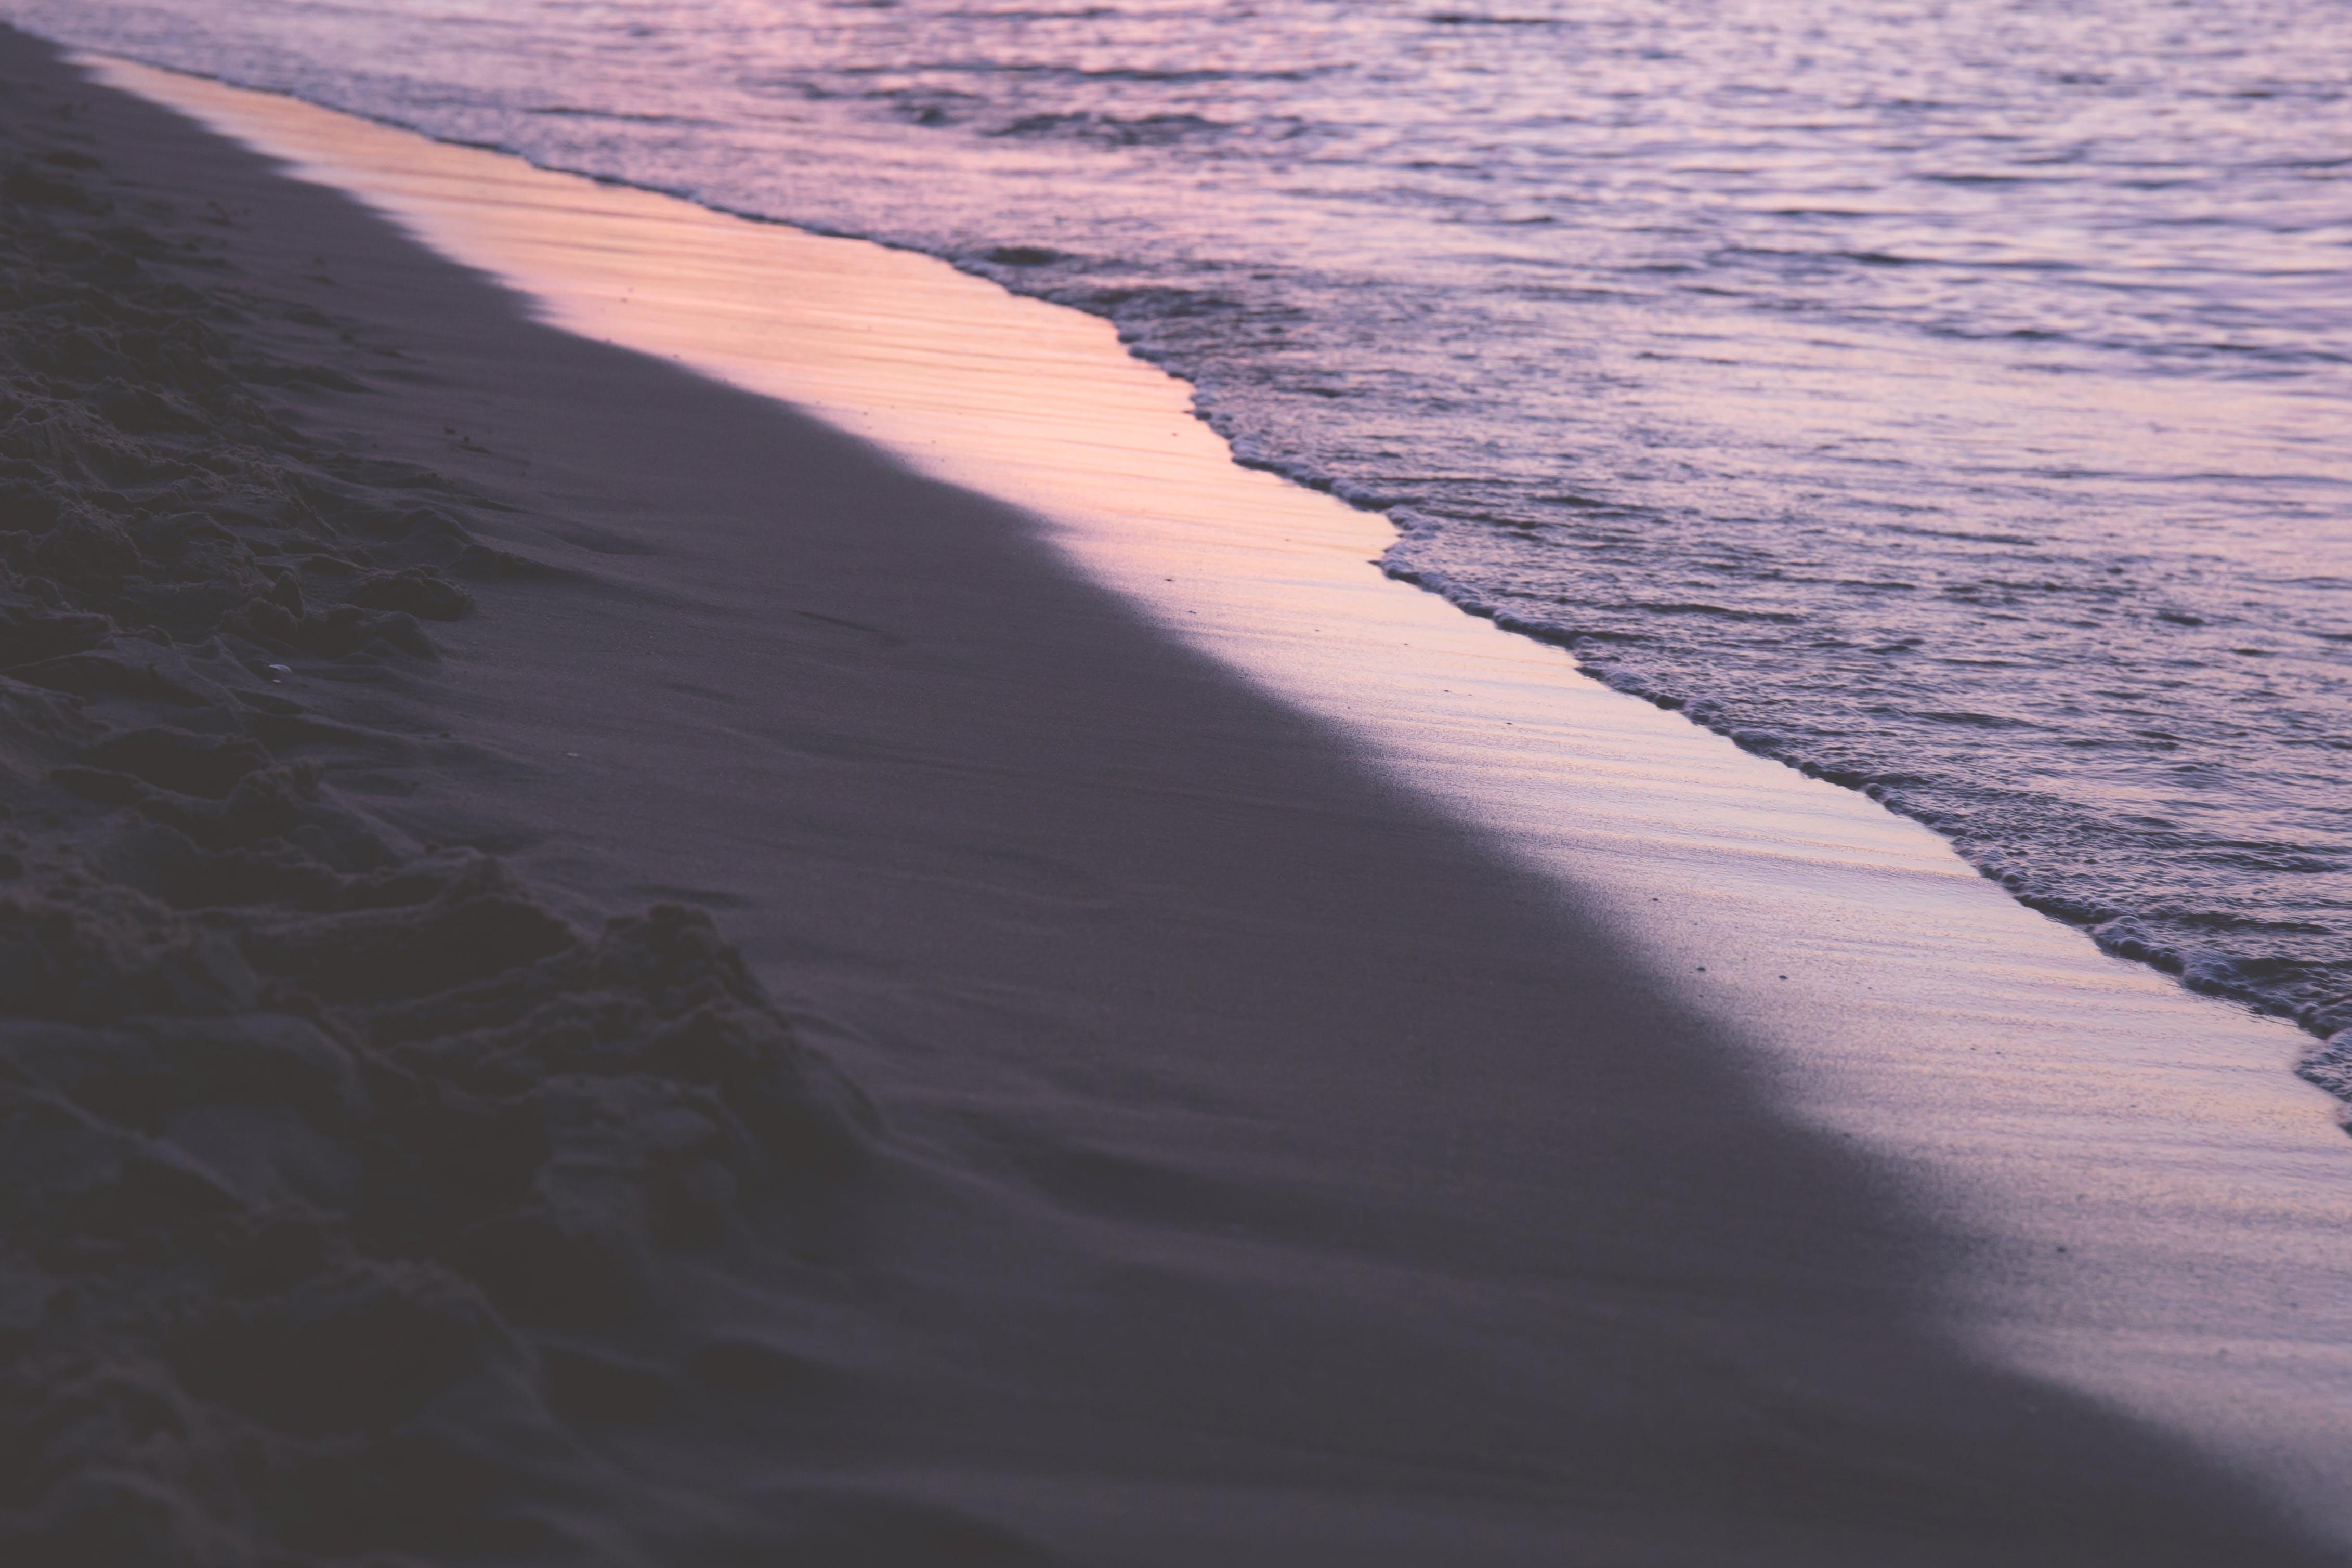 afterglow, bay, beach